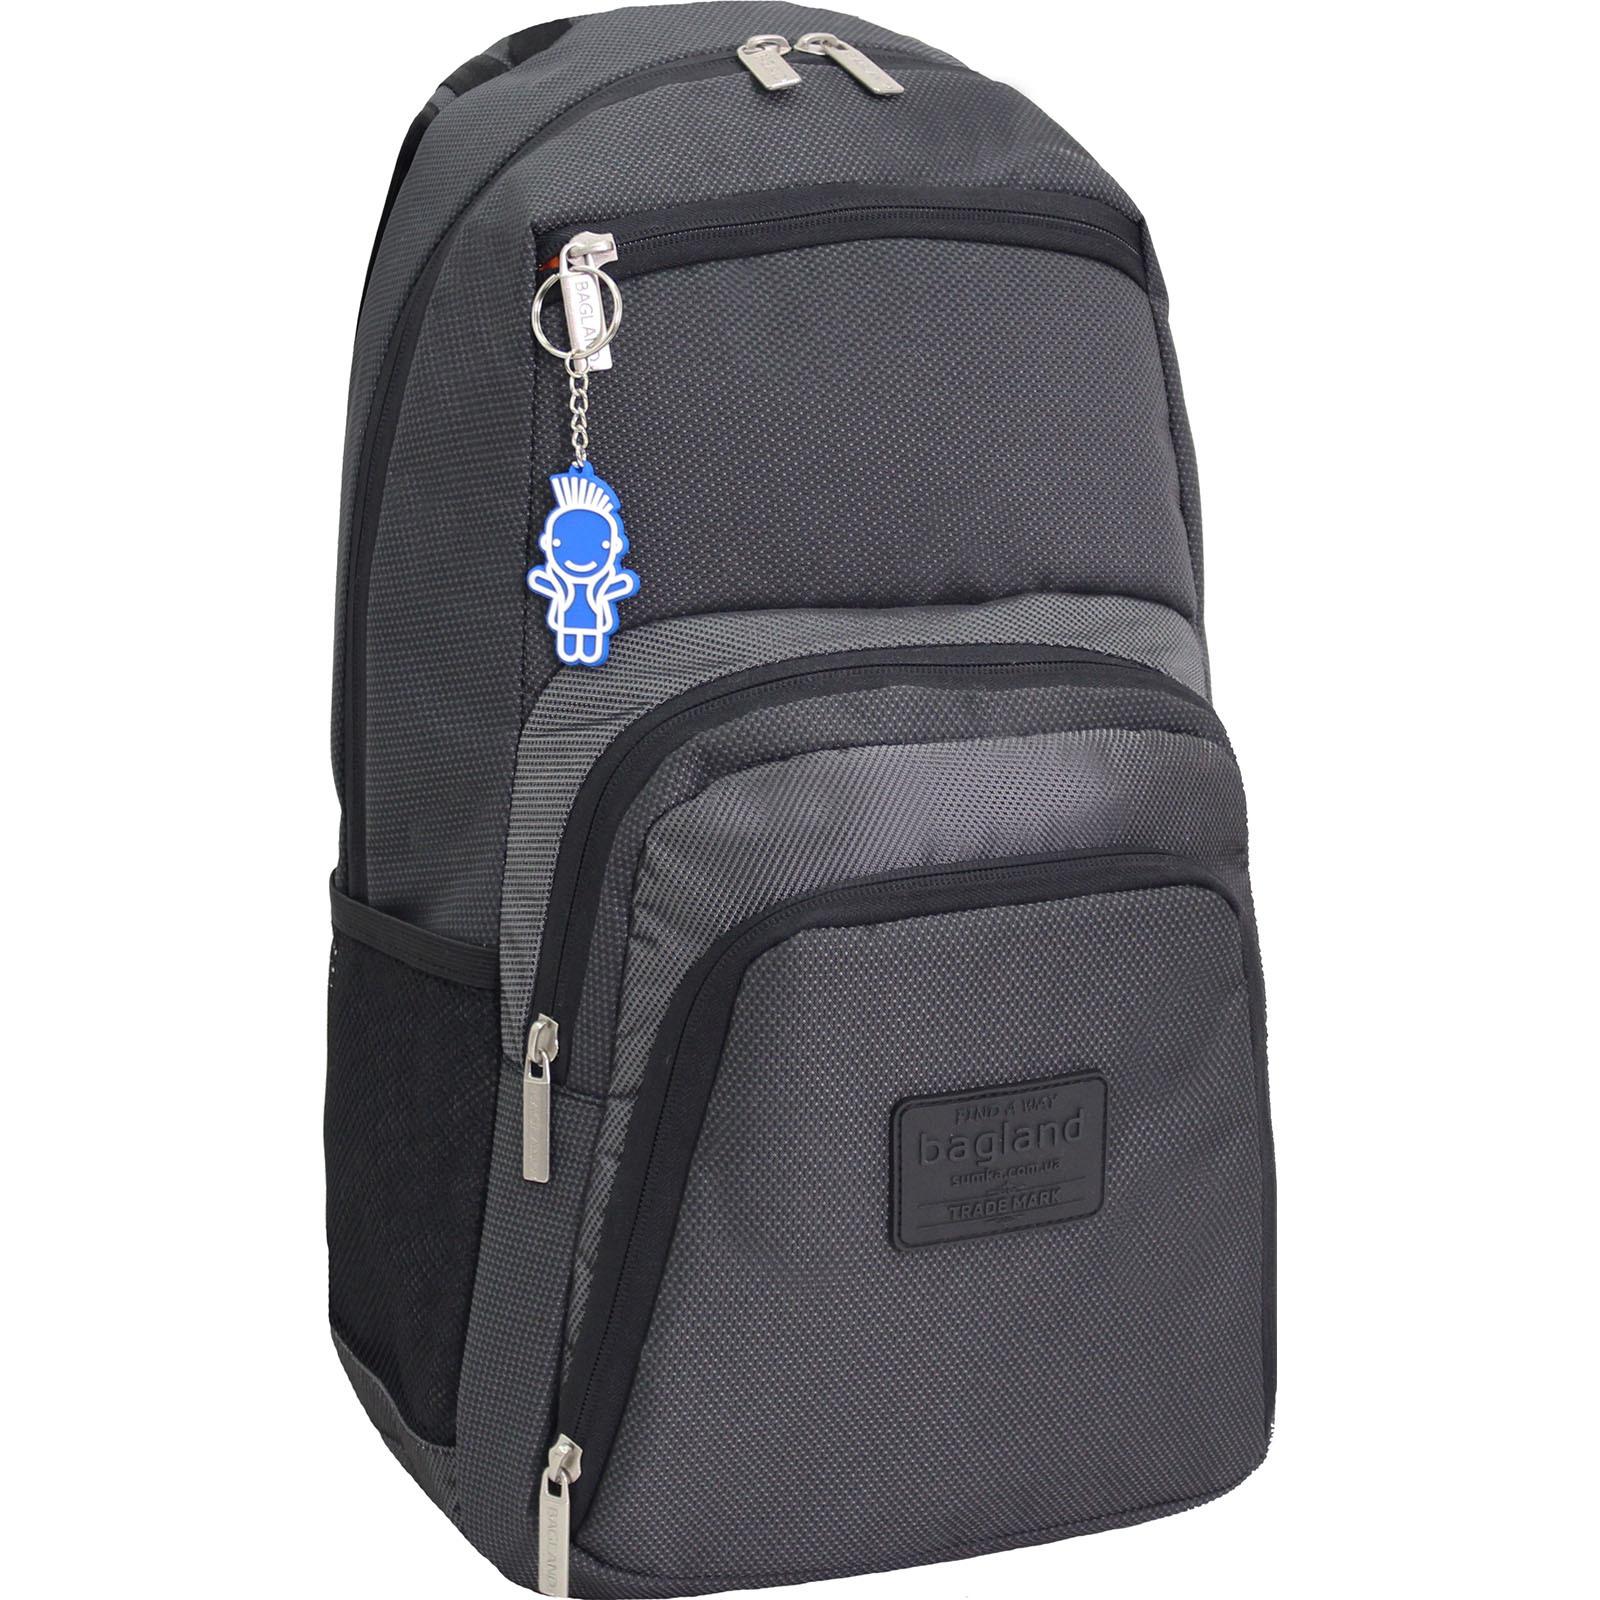 Рюкзаки для ноутбука Рюкзак для ноутбука Bagland Freestyle 21 л. черный /серебро (00119169) IMG_0576.JPG